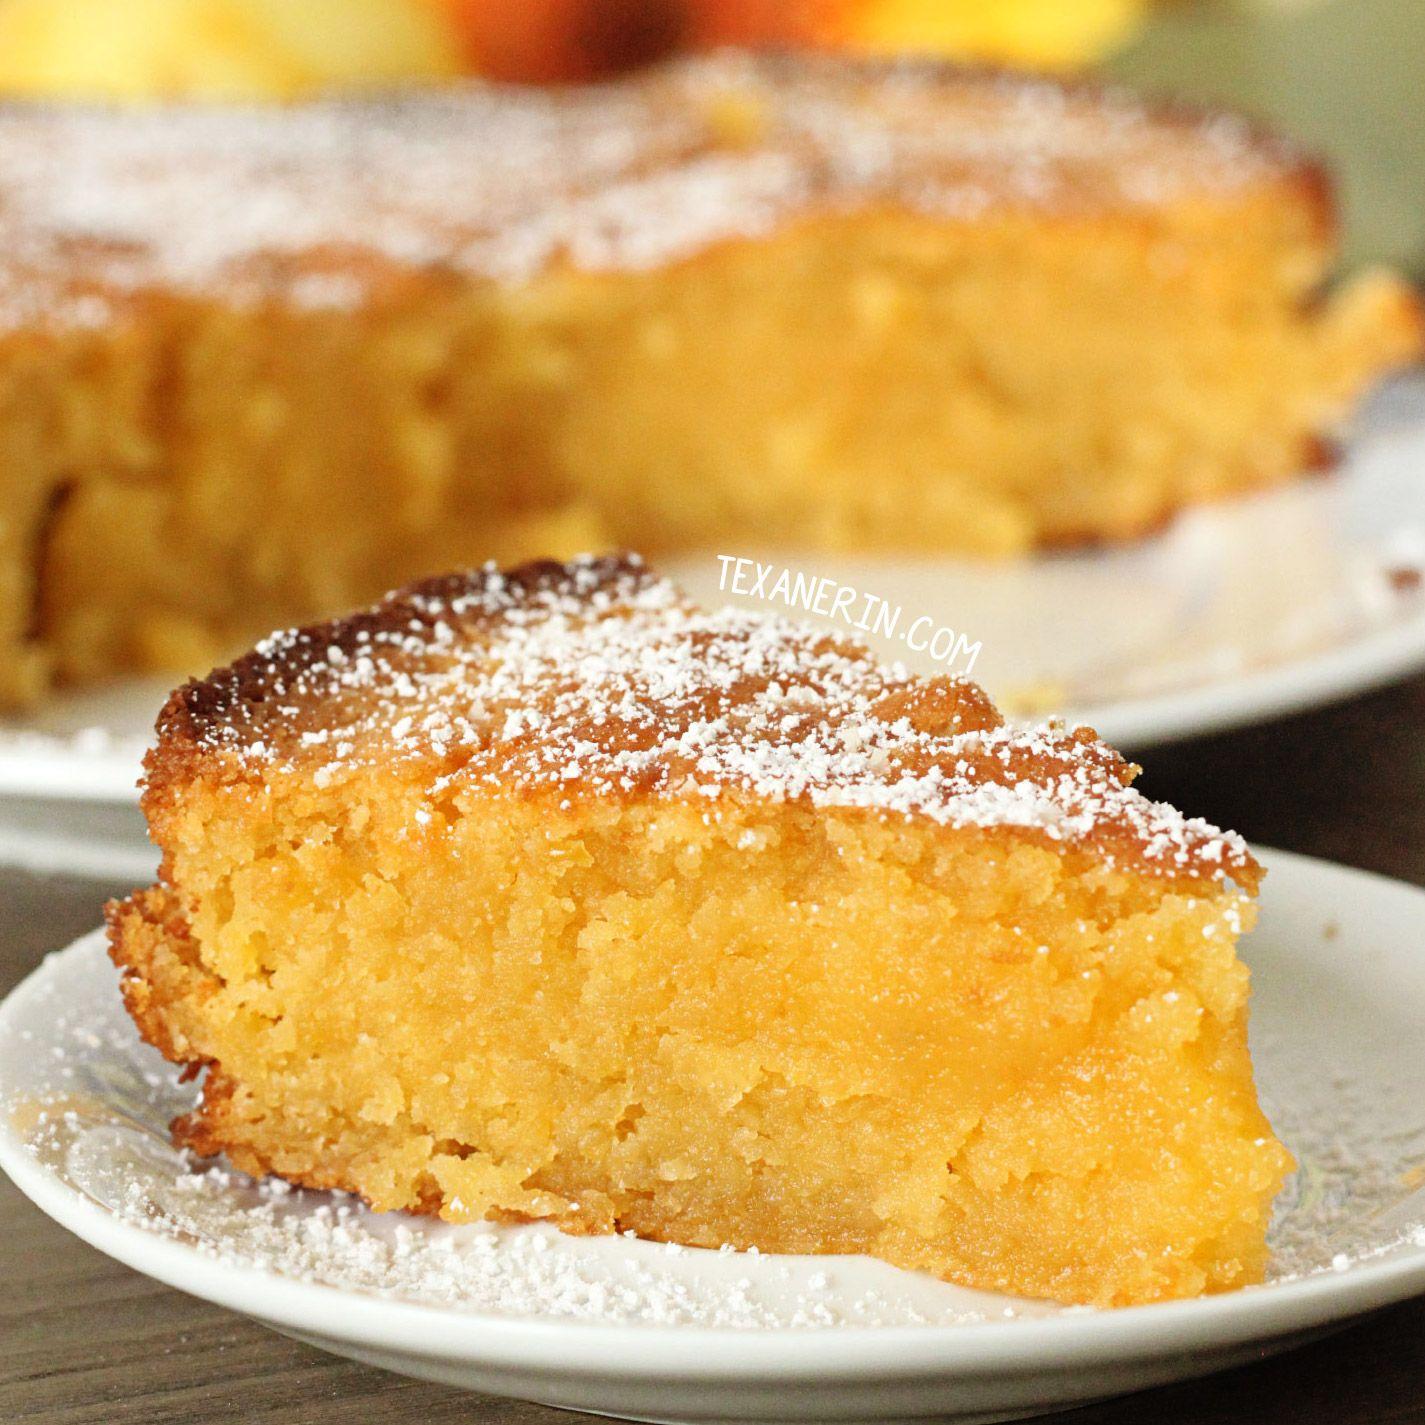 This Italian Lemon Cake Uses Almond Flour And Has A Great Everbest Bjorka Handbag Hitam Flavor